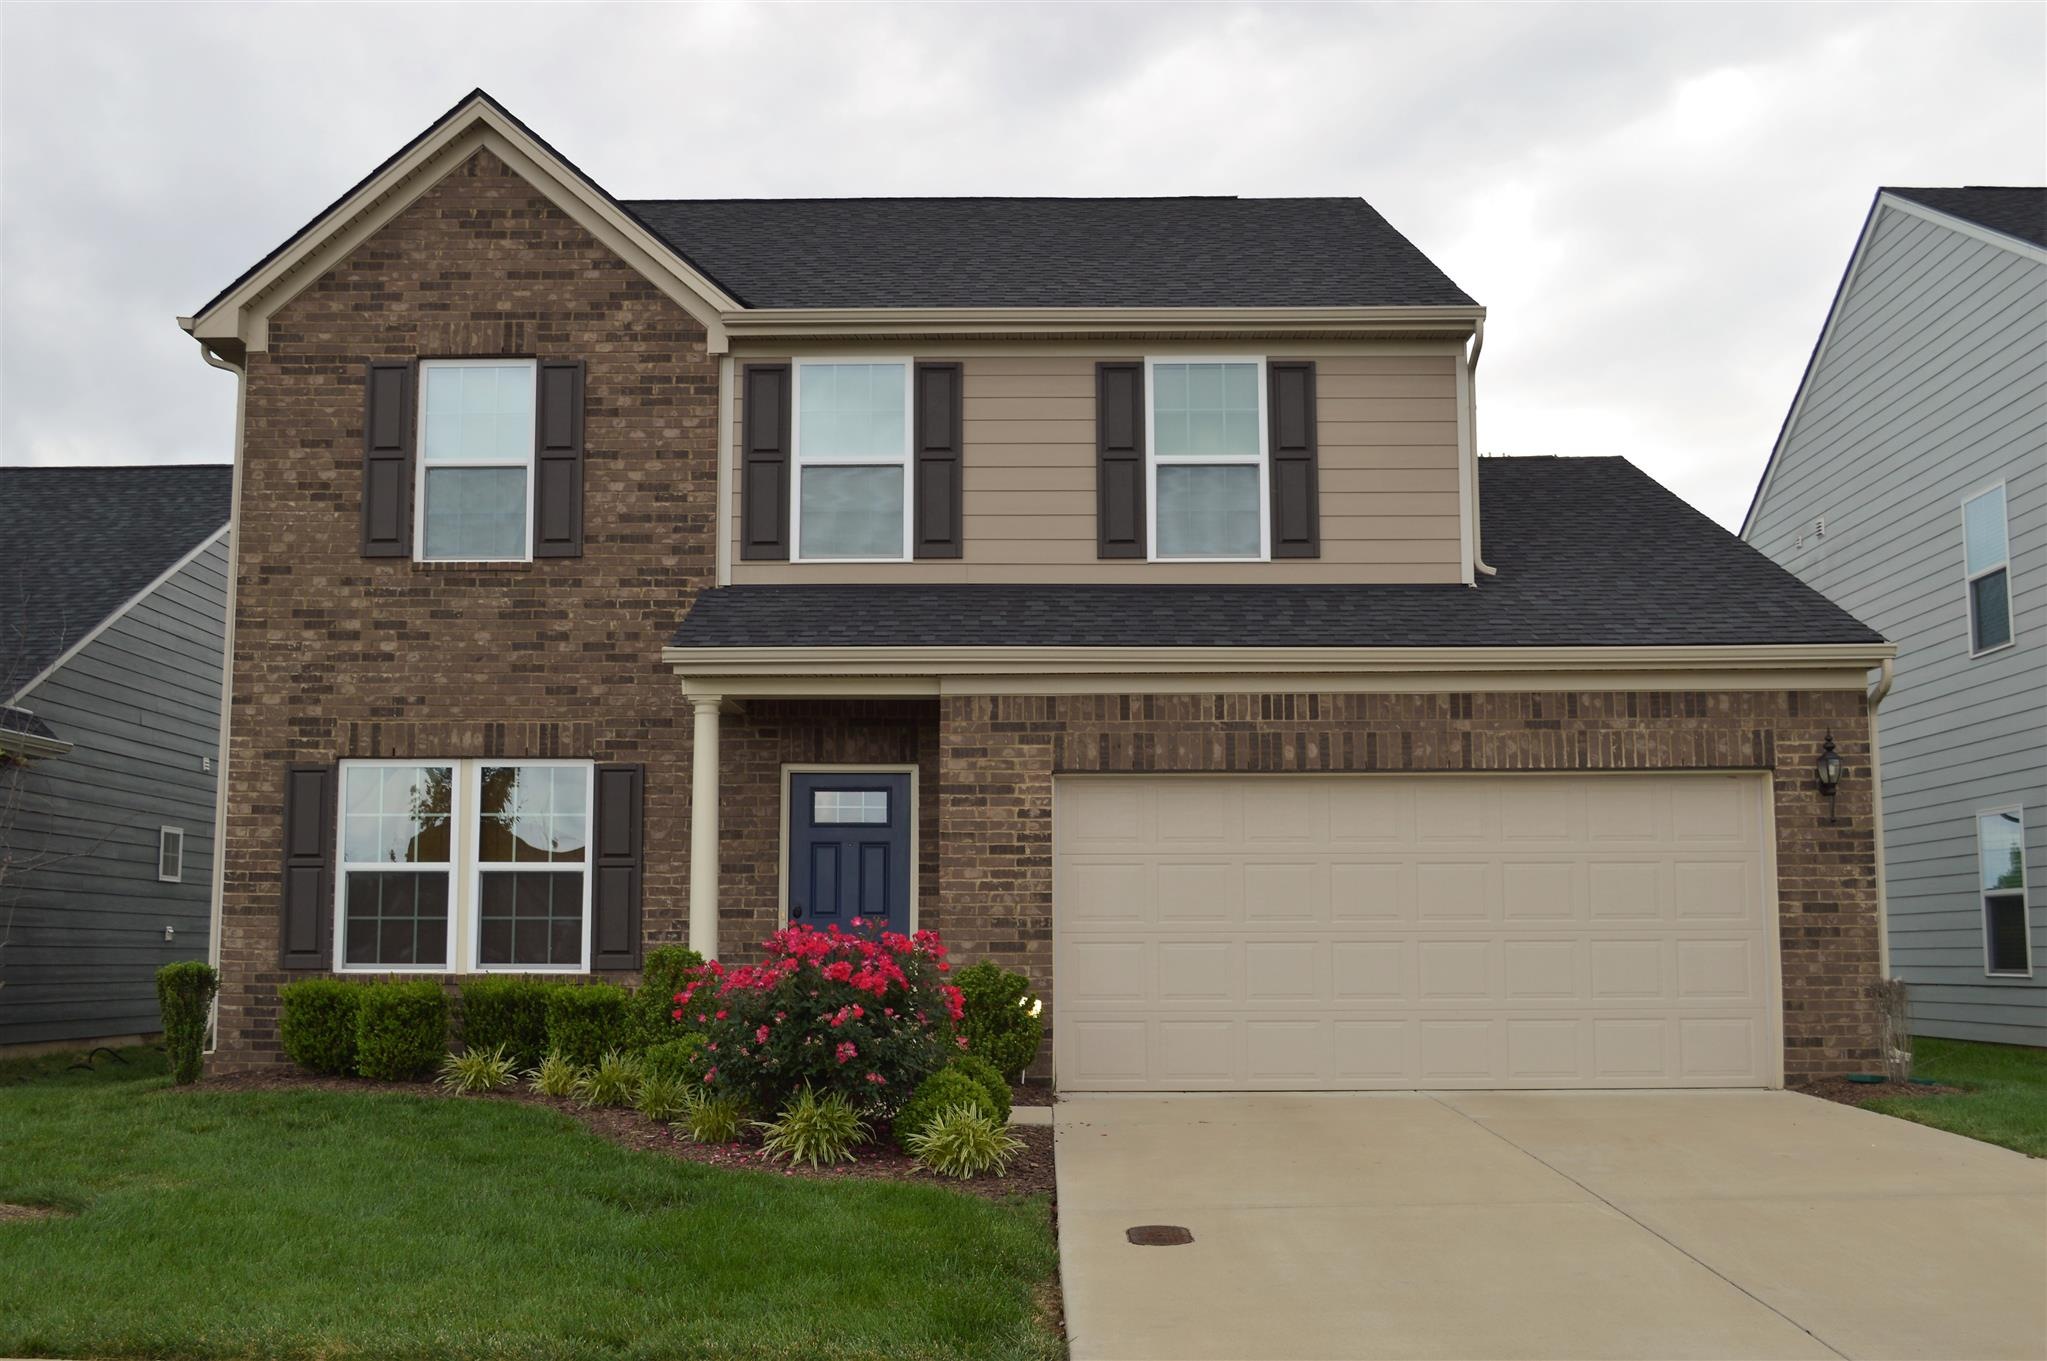 2924 Shellsford Cir, Murfreesboro, TN 37128